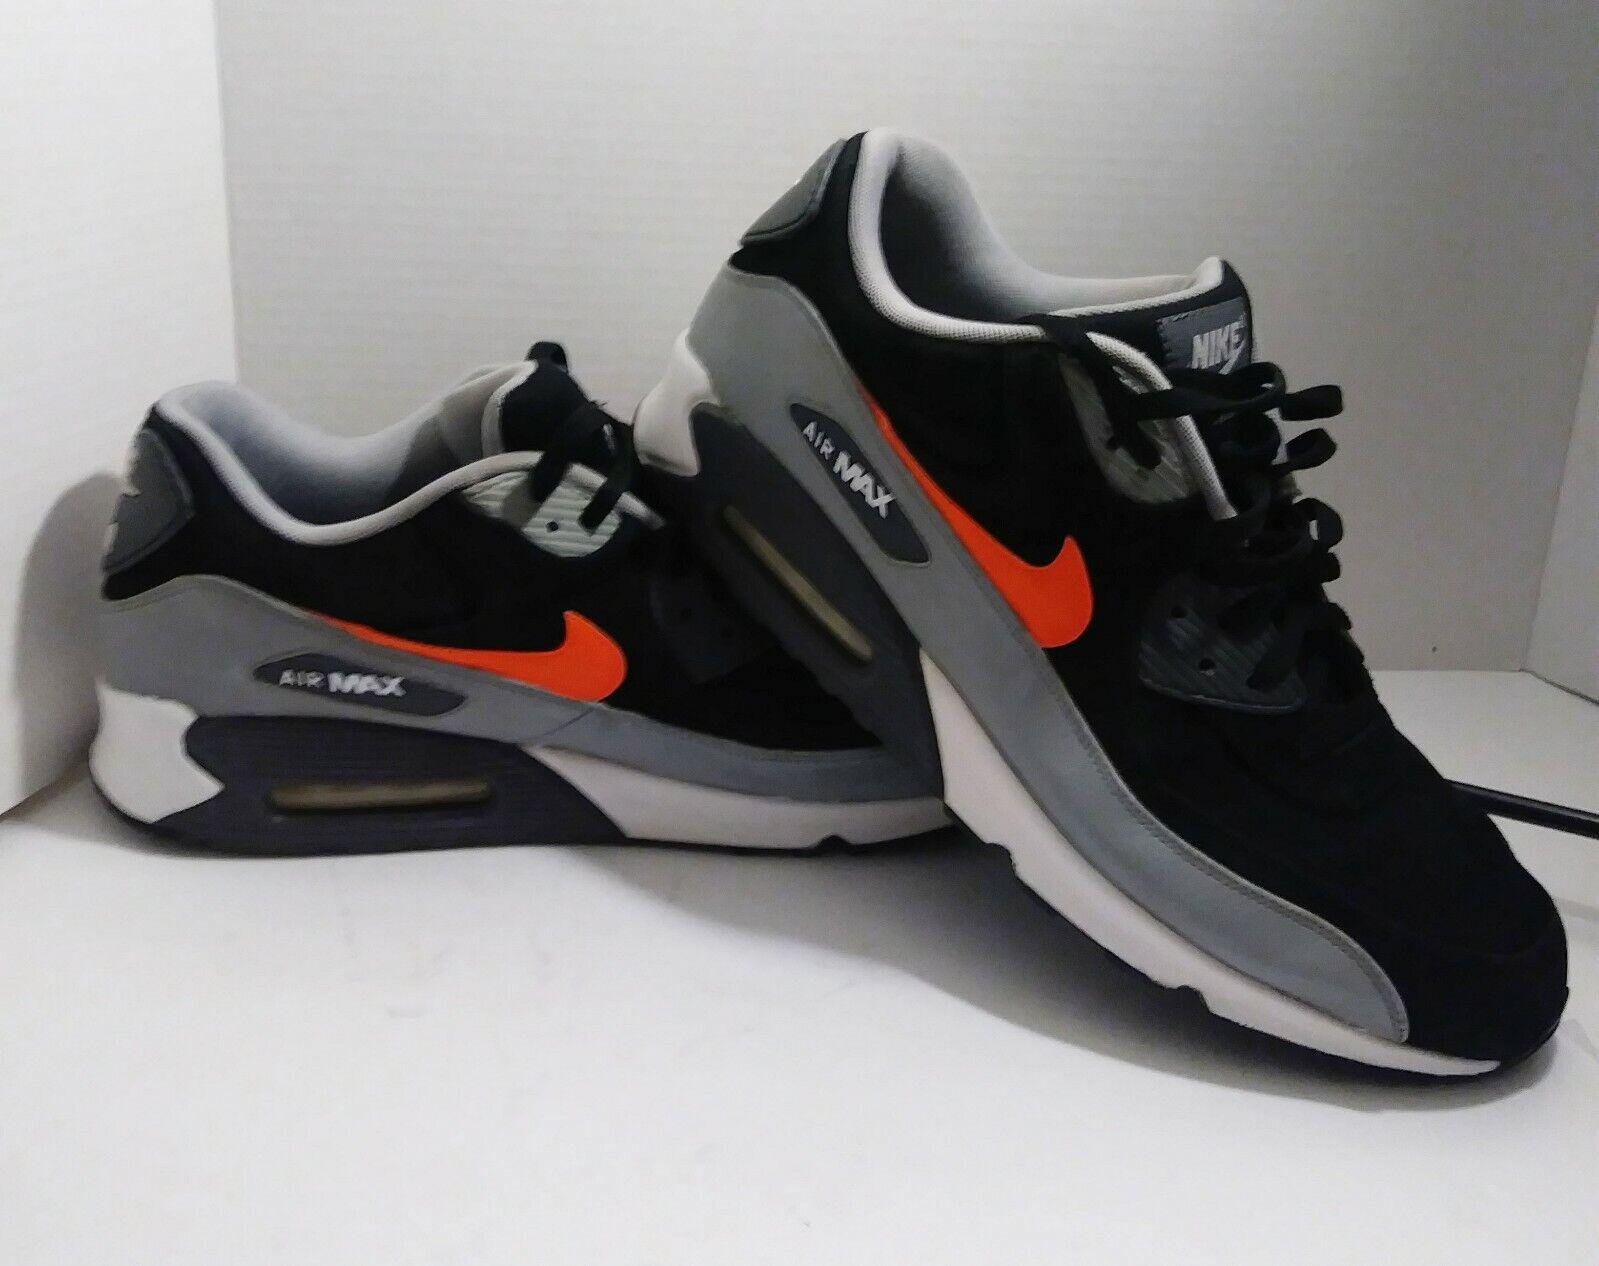 Nike Air Max 90 Ltr Leather Premium Black-Grey-Silver orange 666578-005 - SZ 14